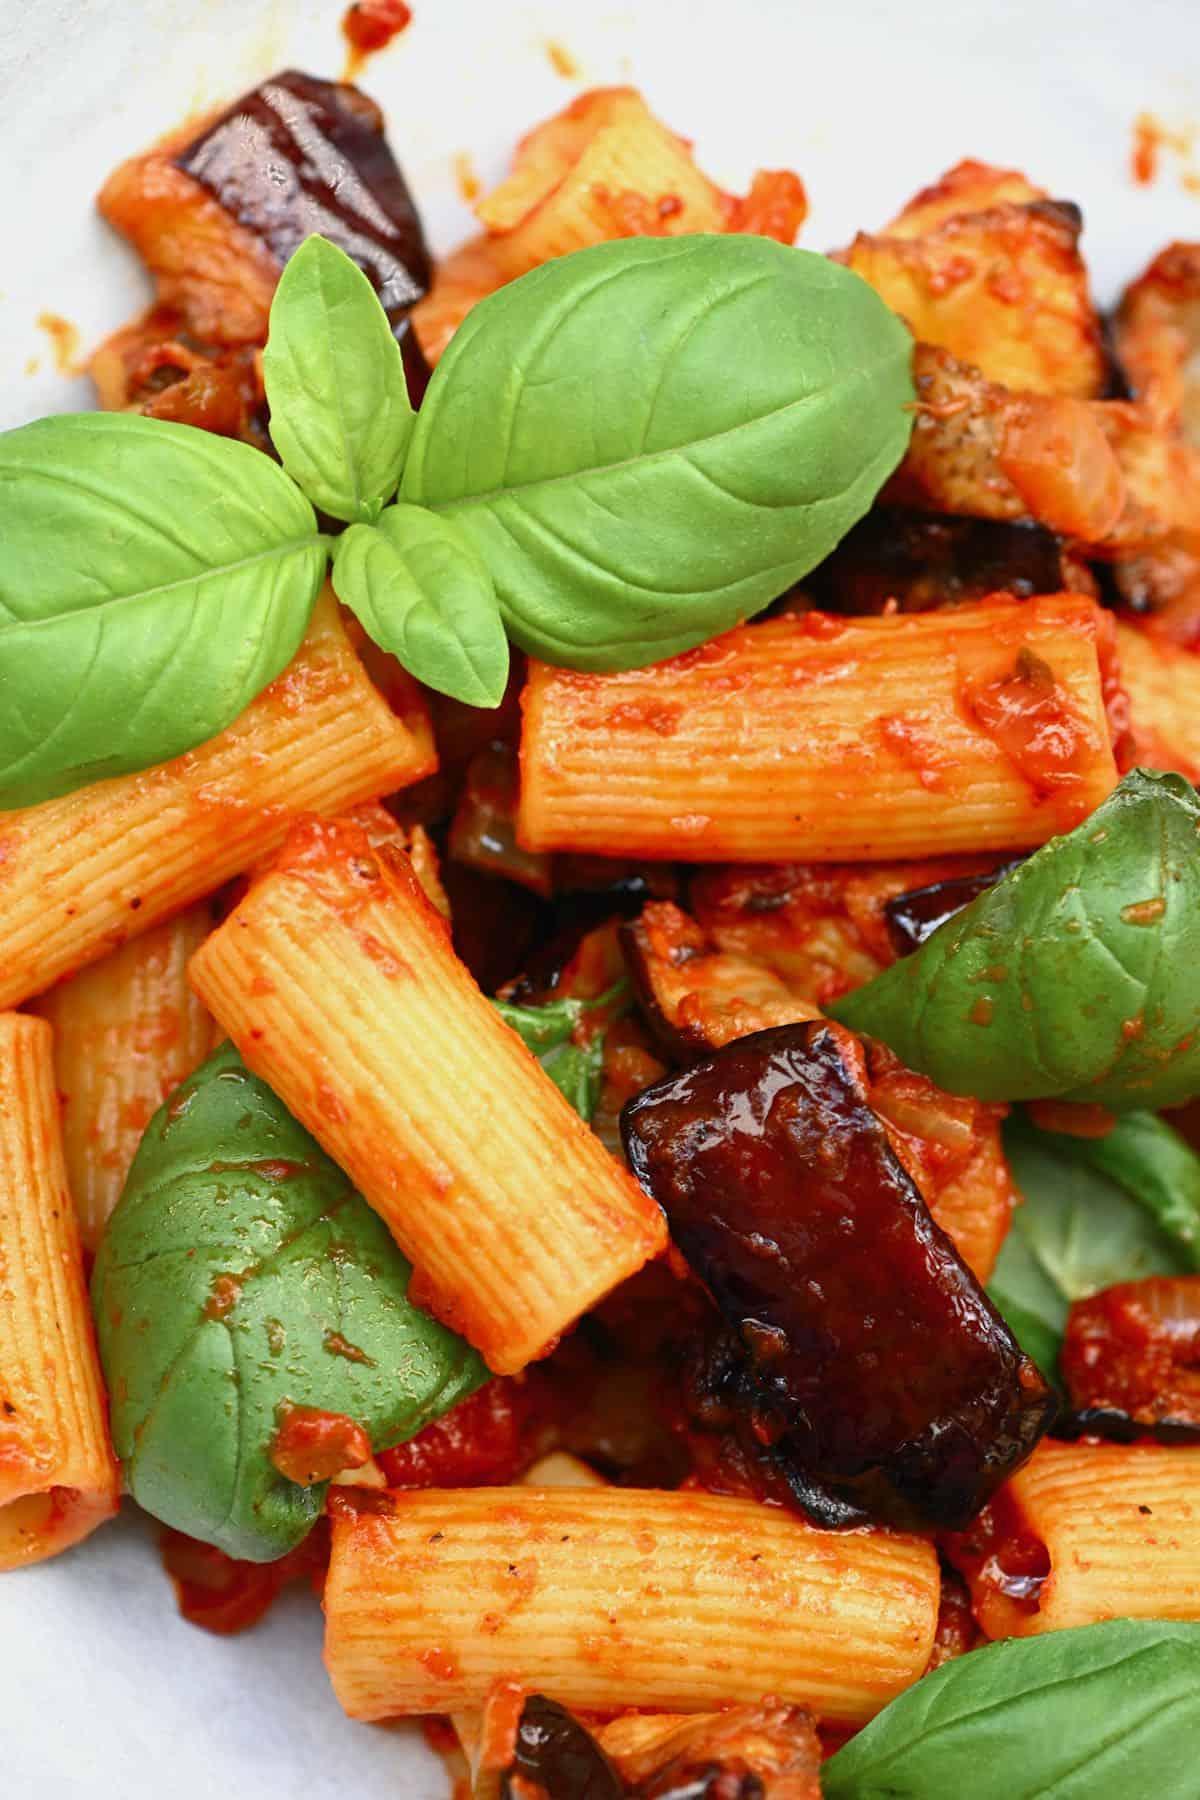 Tomato eggplant pasta